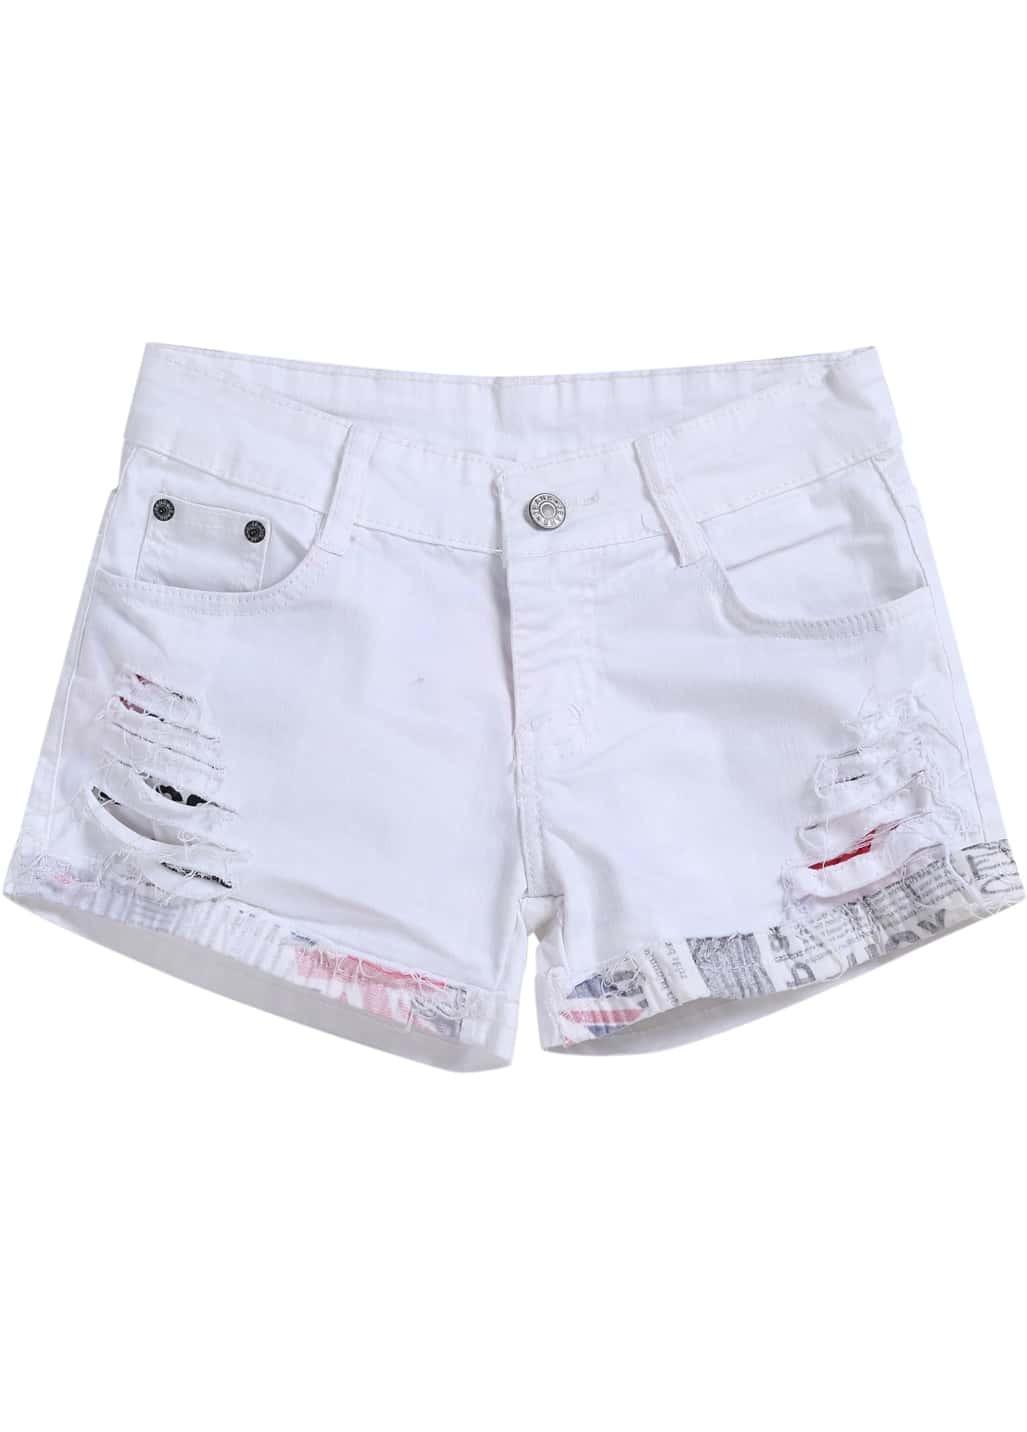 White Ripped Pockets Denim Shorts